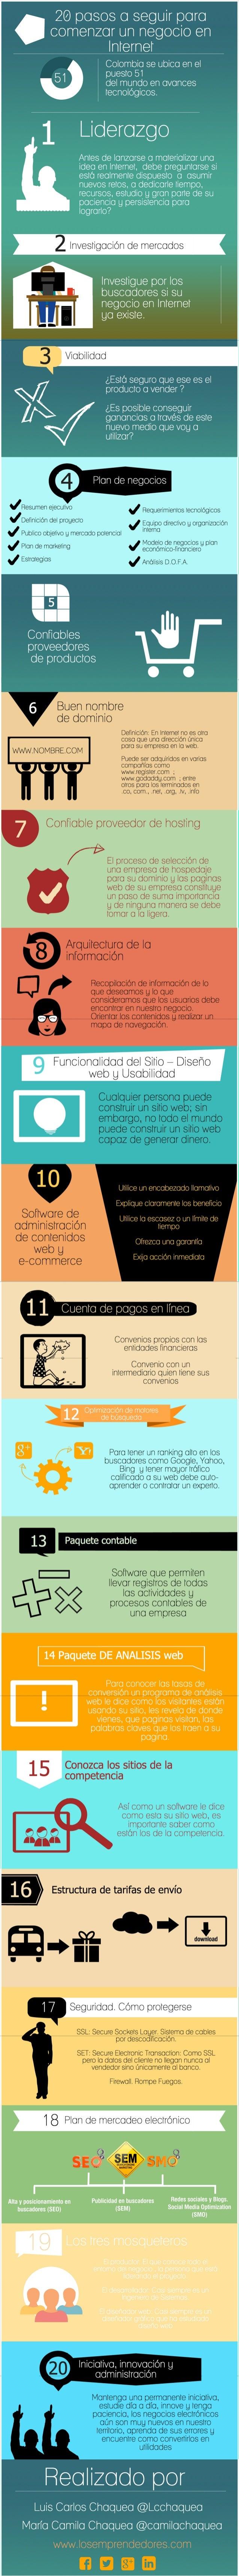 Infografía 20 pasos a seguir para comenzar un negocio en Internet